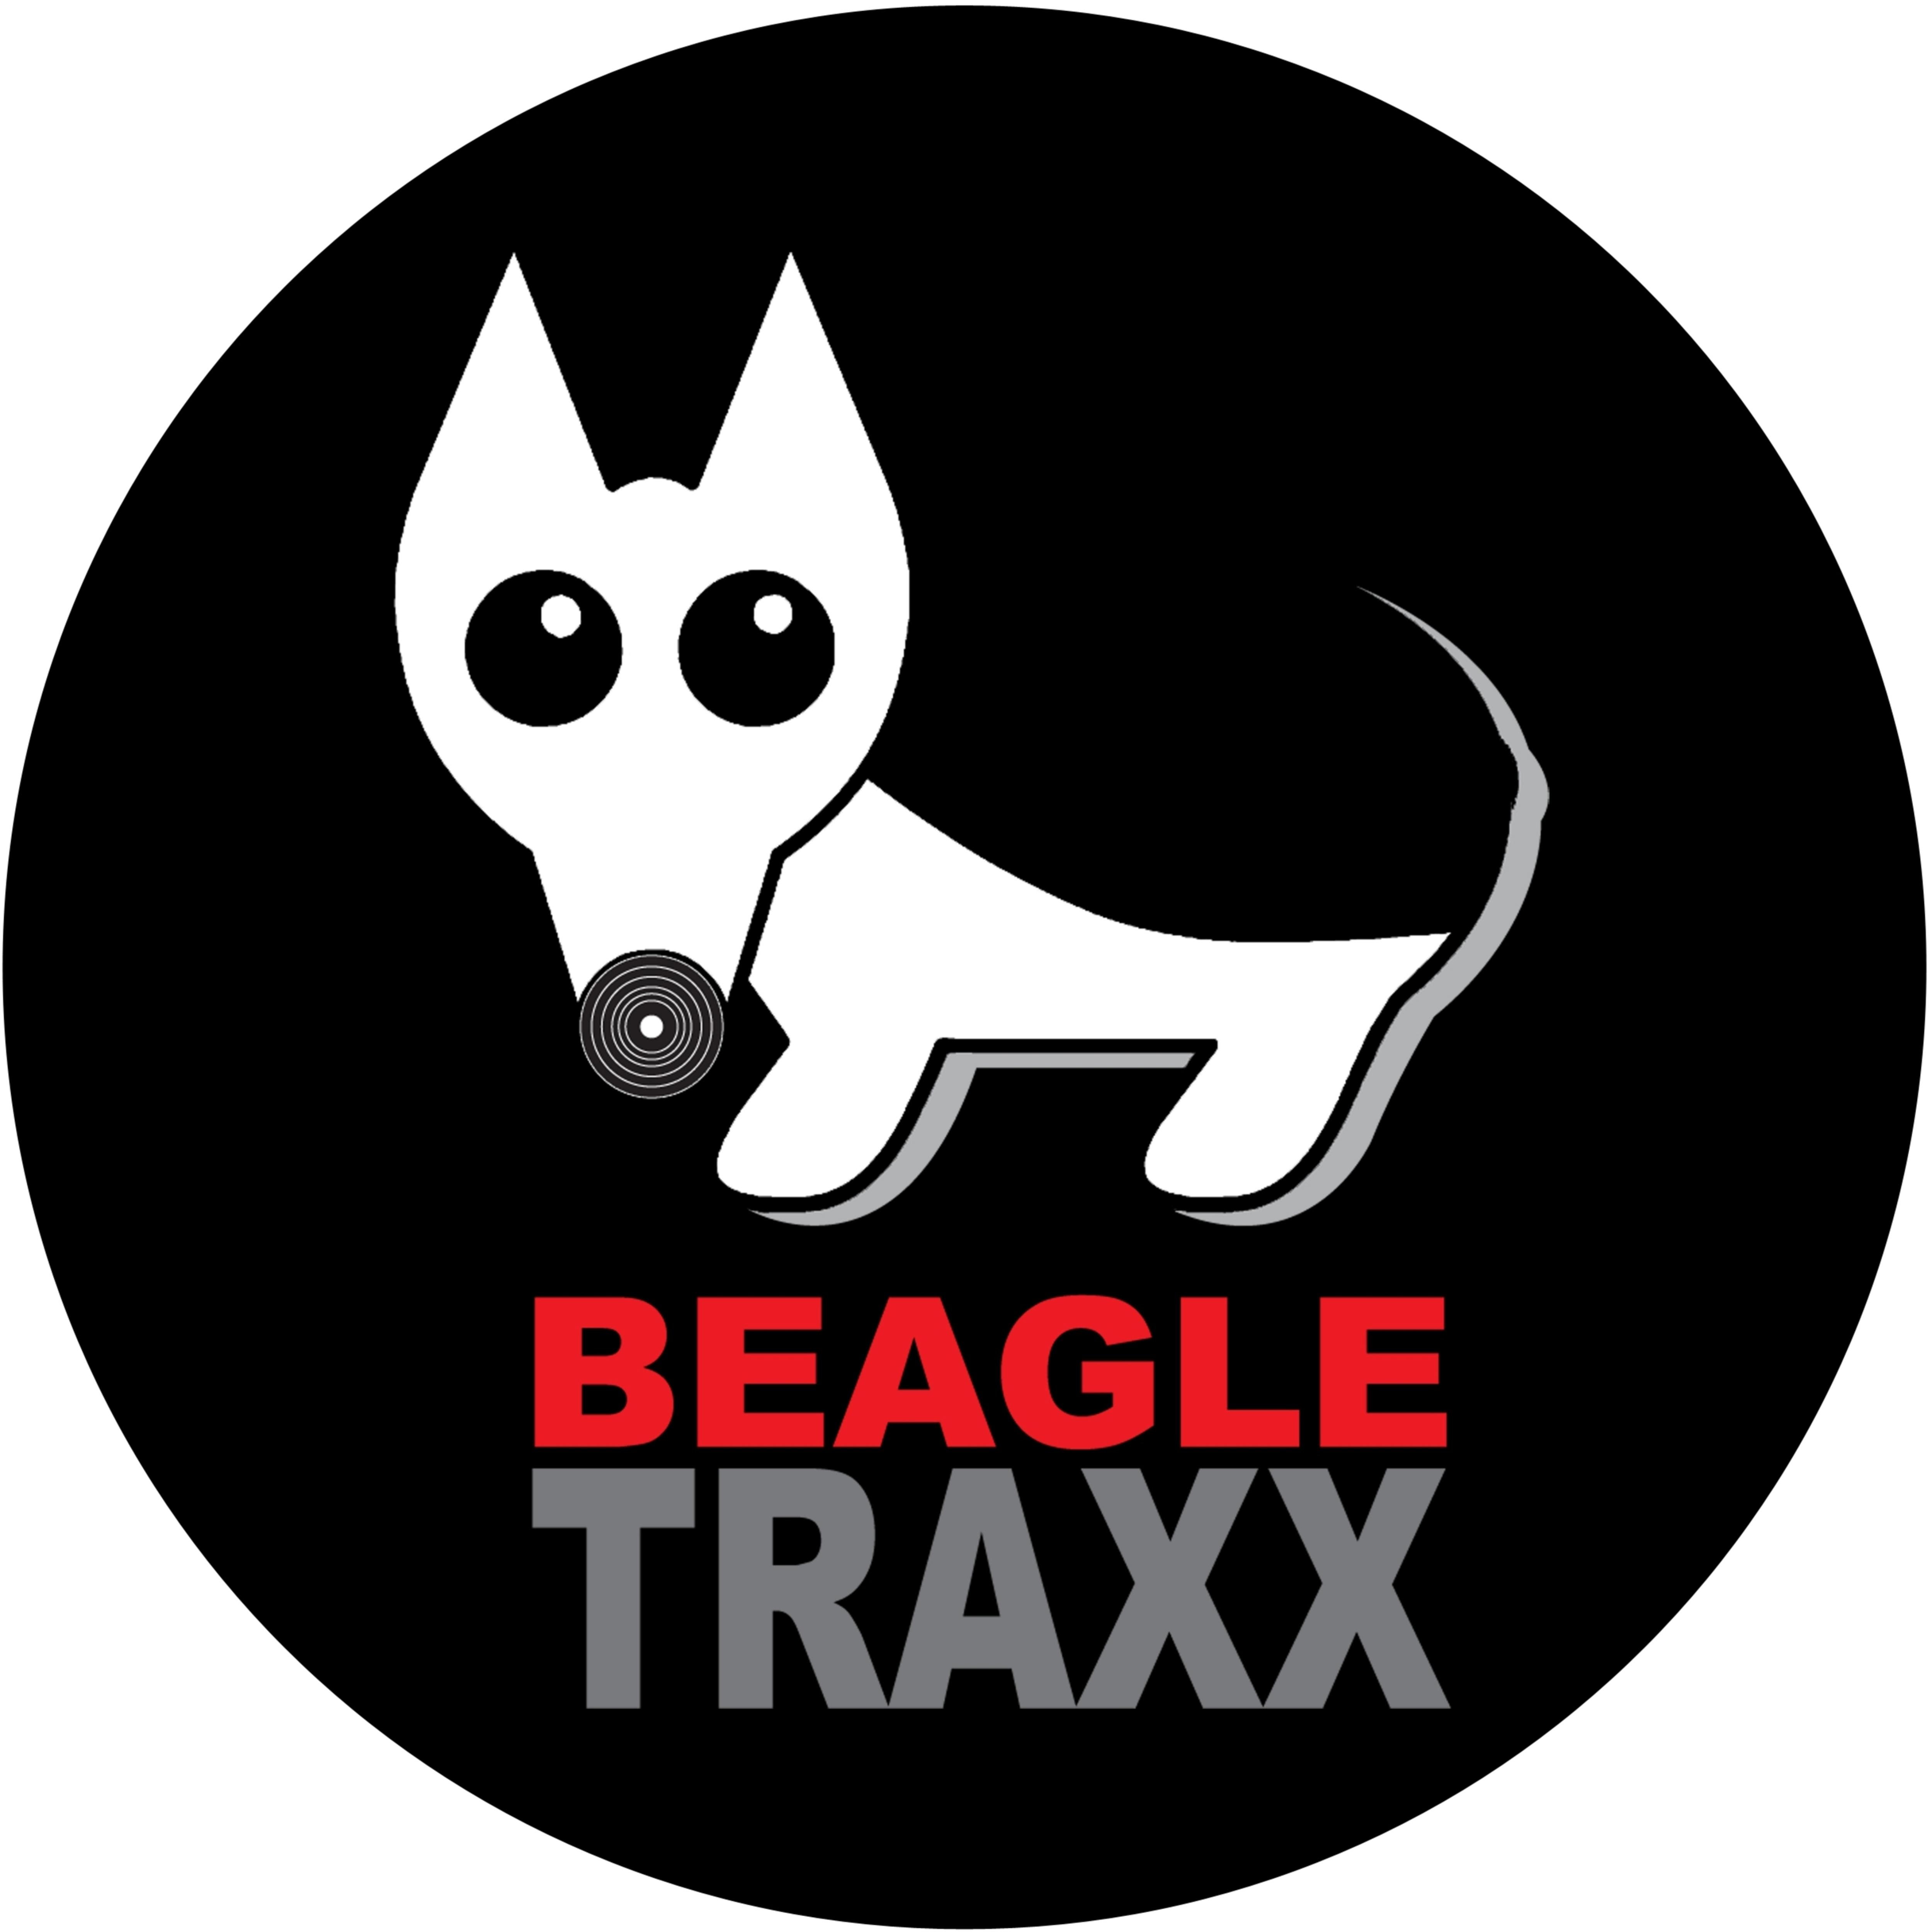 Beagle Traxx